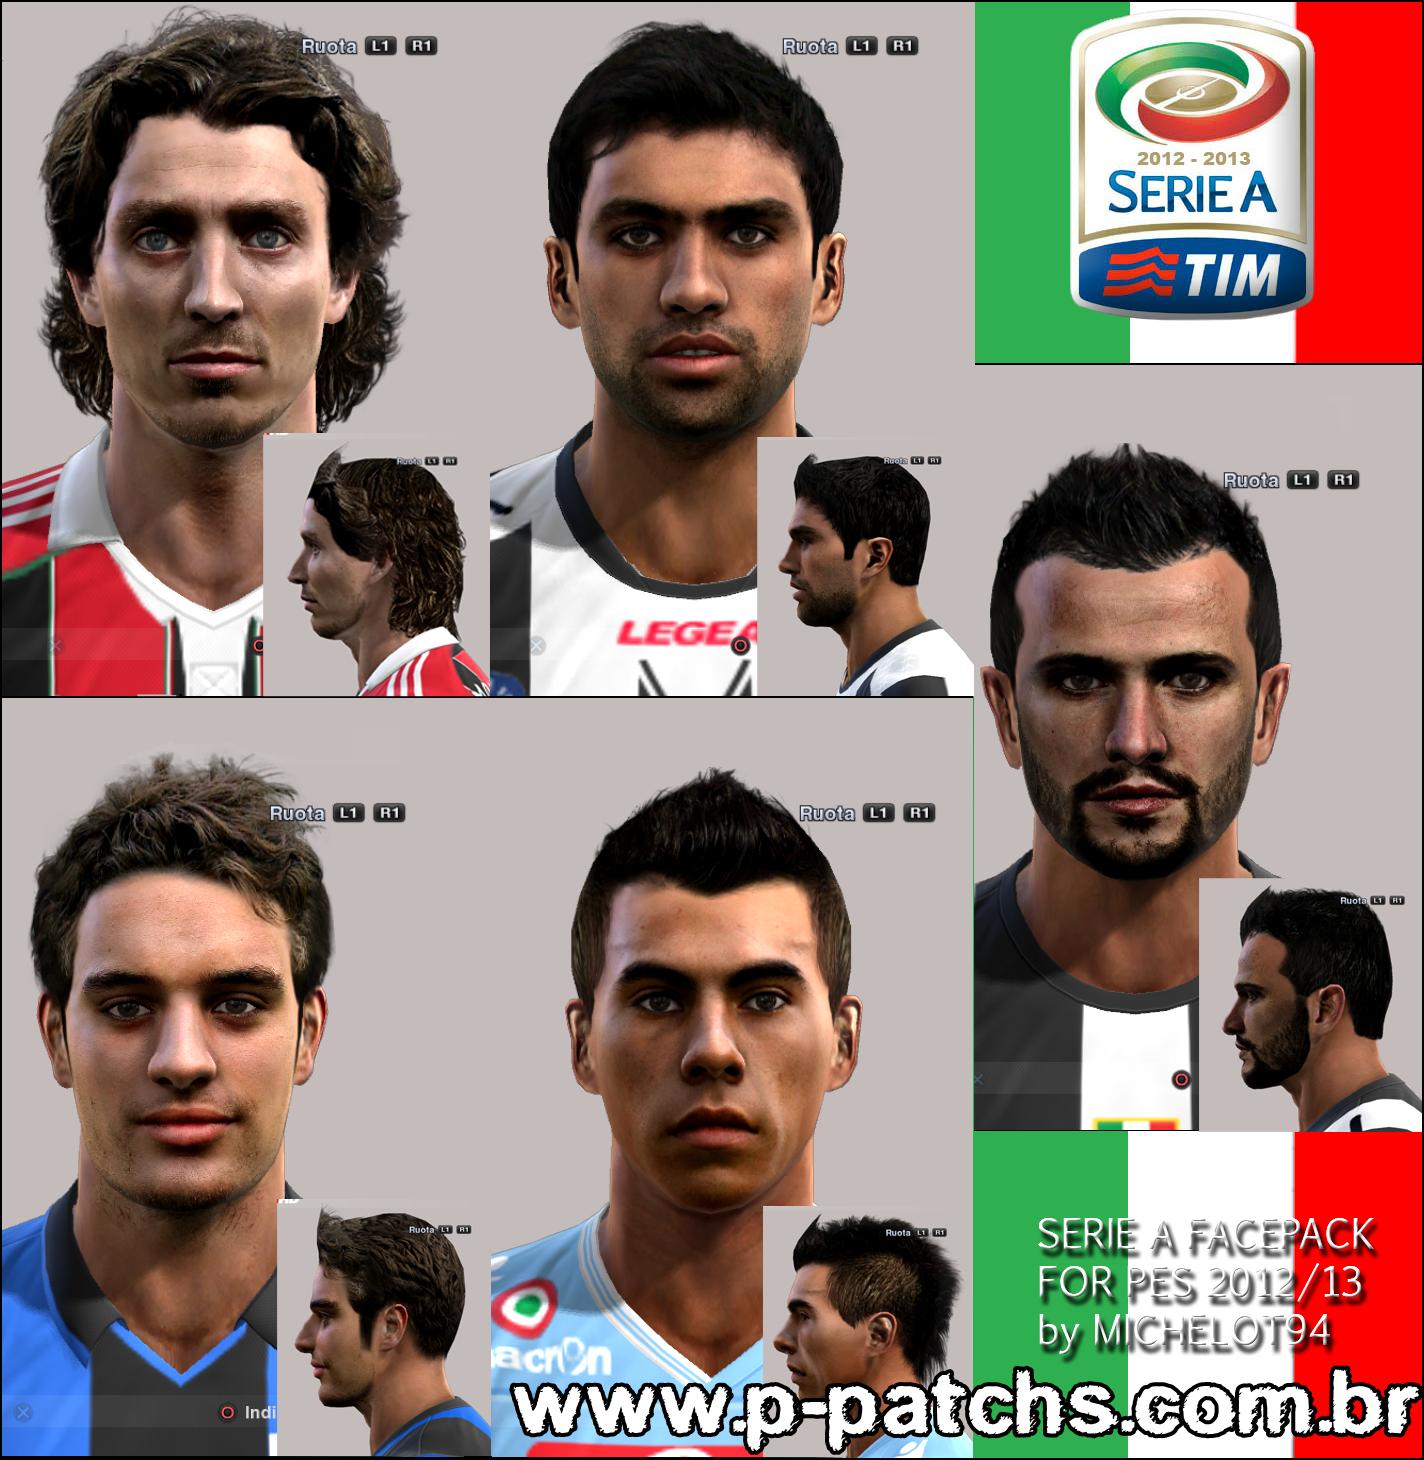 Montolivo, Danilo, Bonaventura, Eduardo Vargas e Simone Pepe Faces - PES 2013